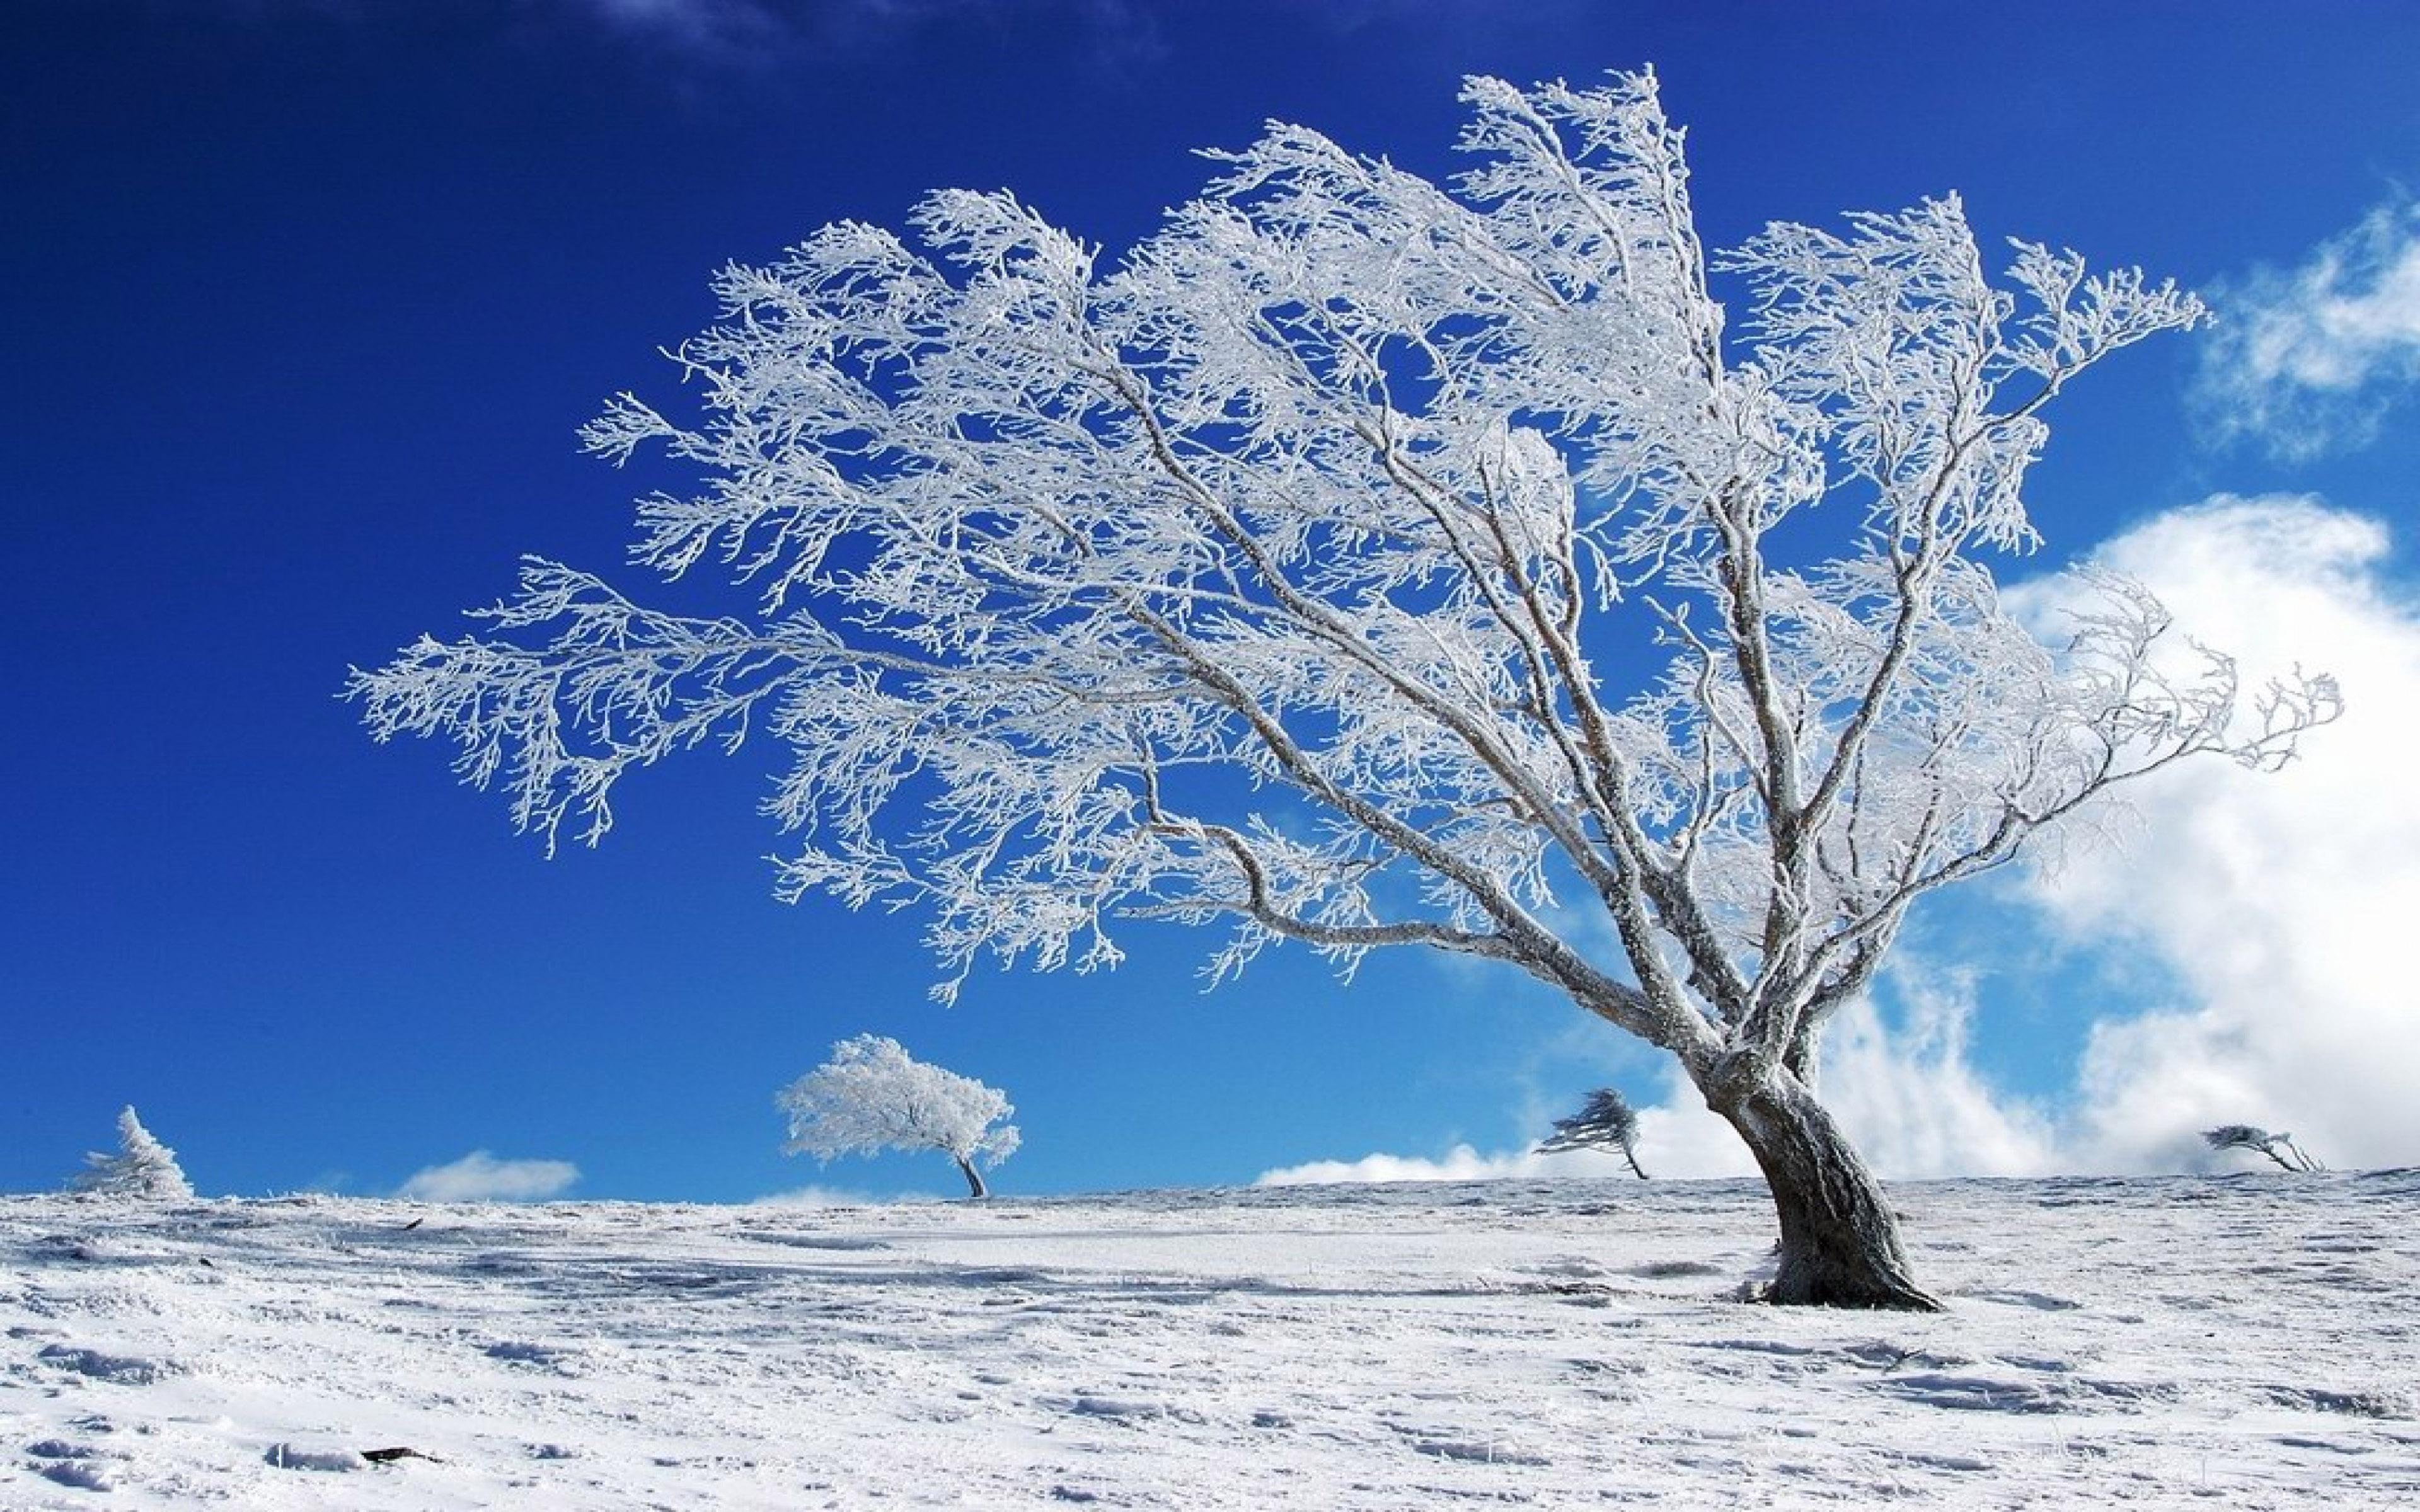 Free Animated Snow Fall Wallpaper Beautiful Background Winter Snow Tree Hd Wallpaper